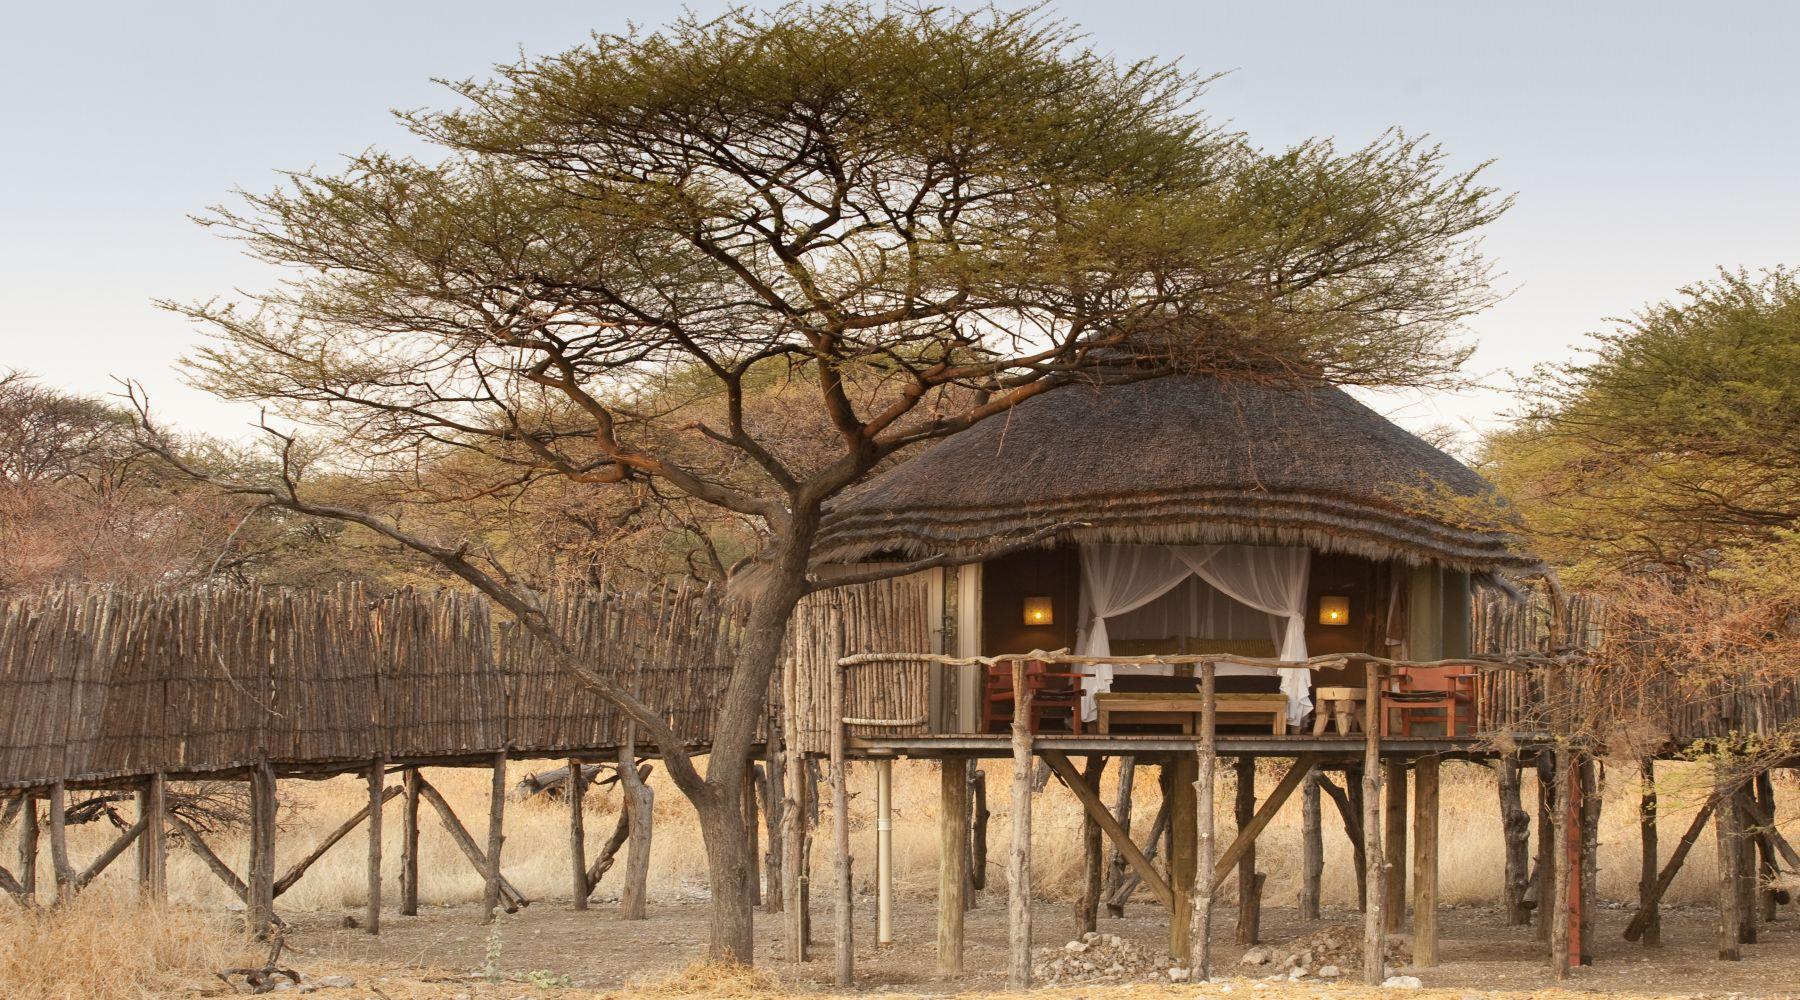 Onguma Tree Top Camp